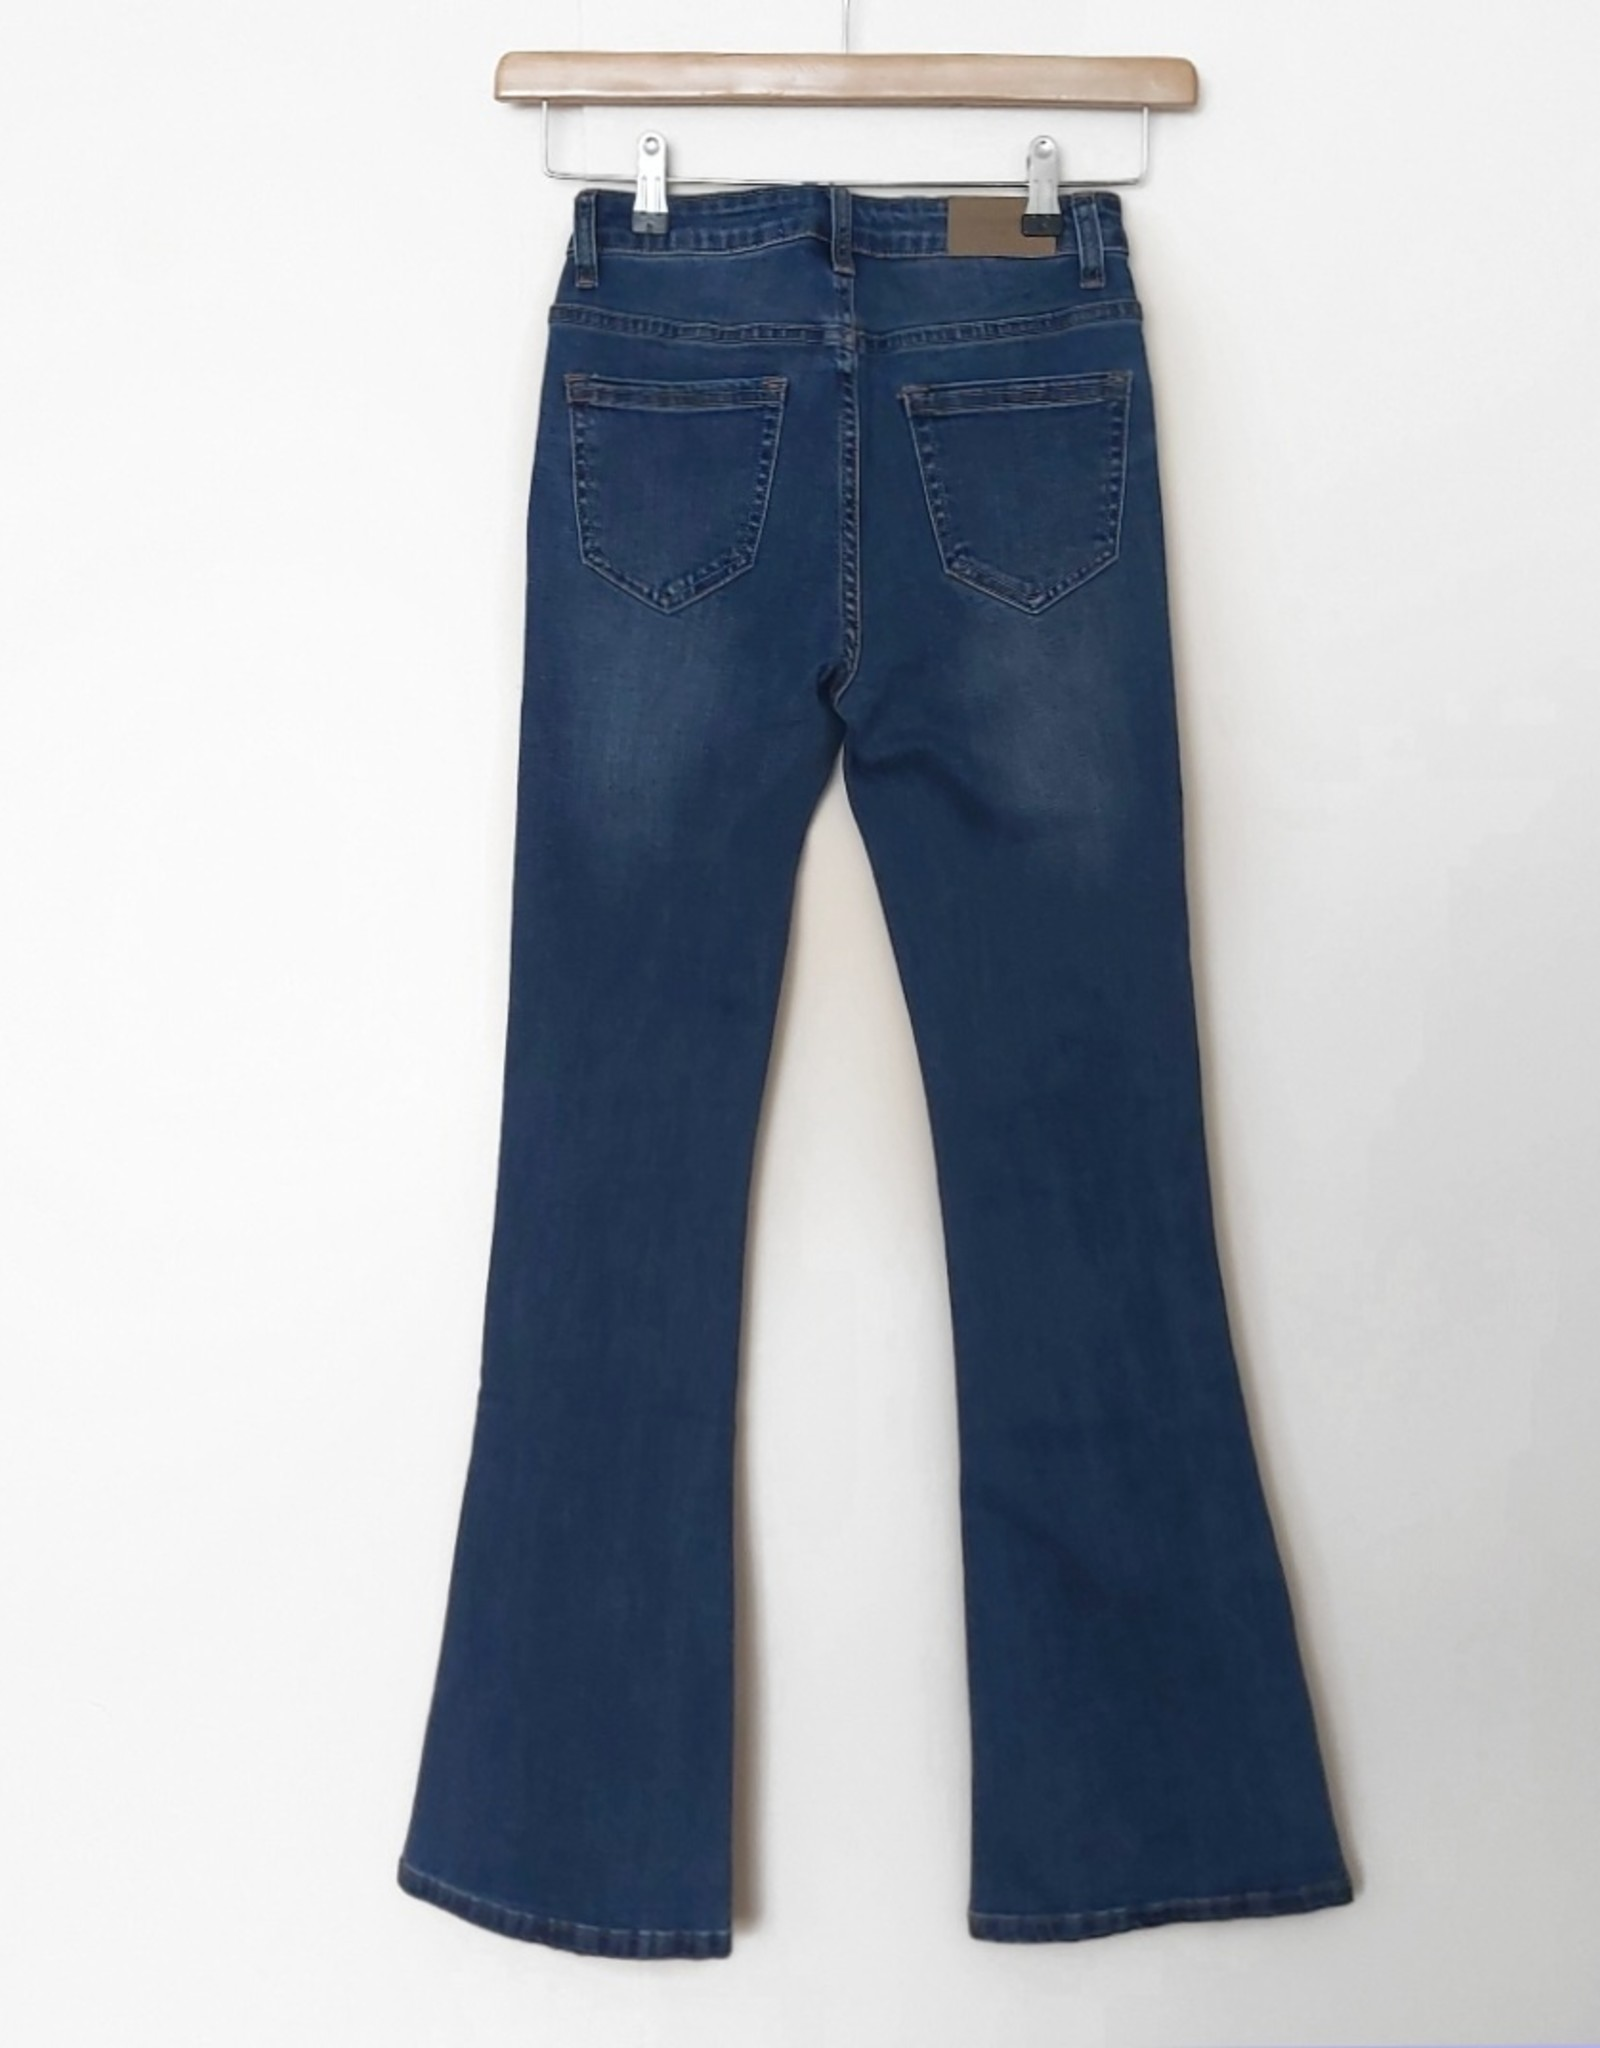 Nina Carter Flared Jeans